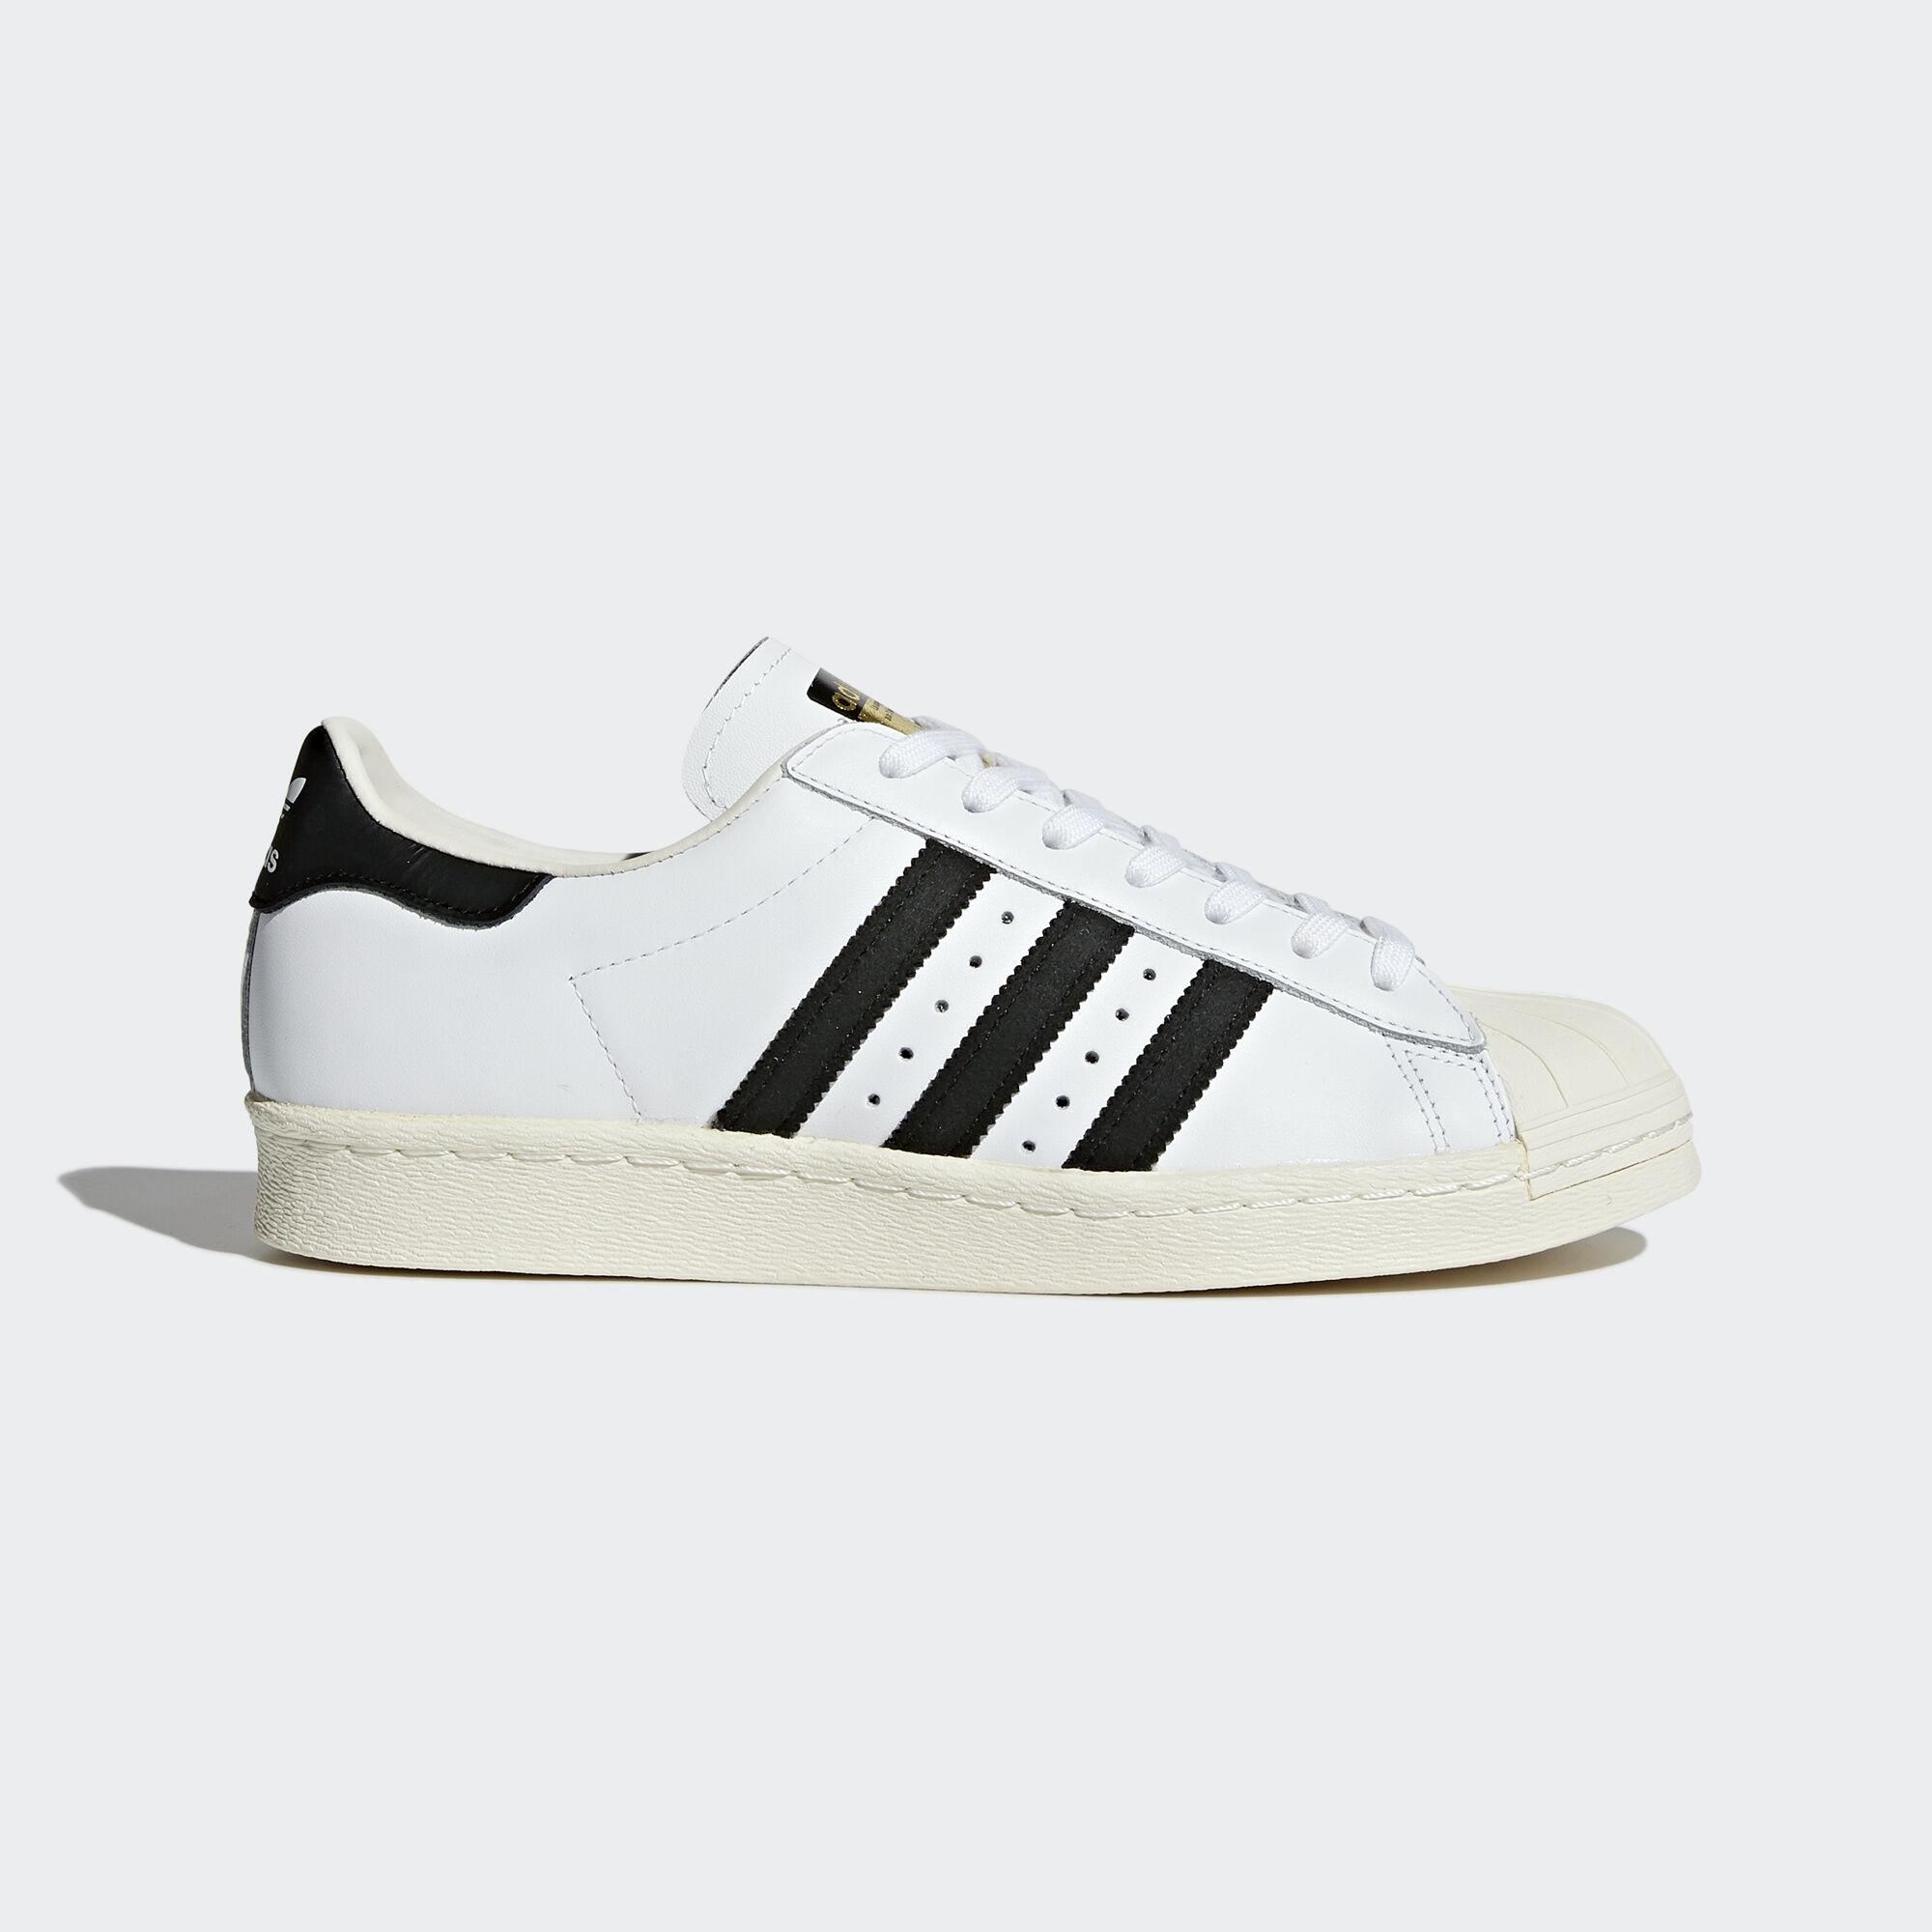 adidas - Superstar 80s White/Core Black/Chalk White G61070